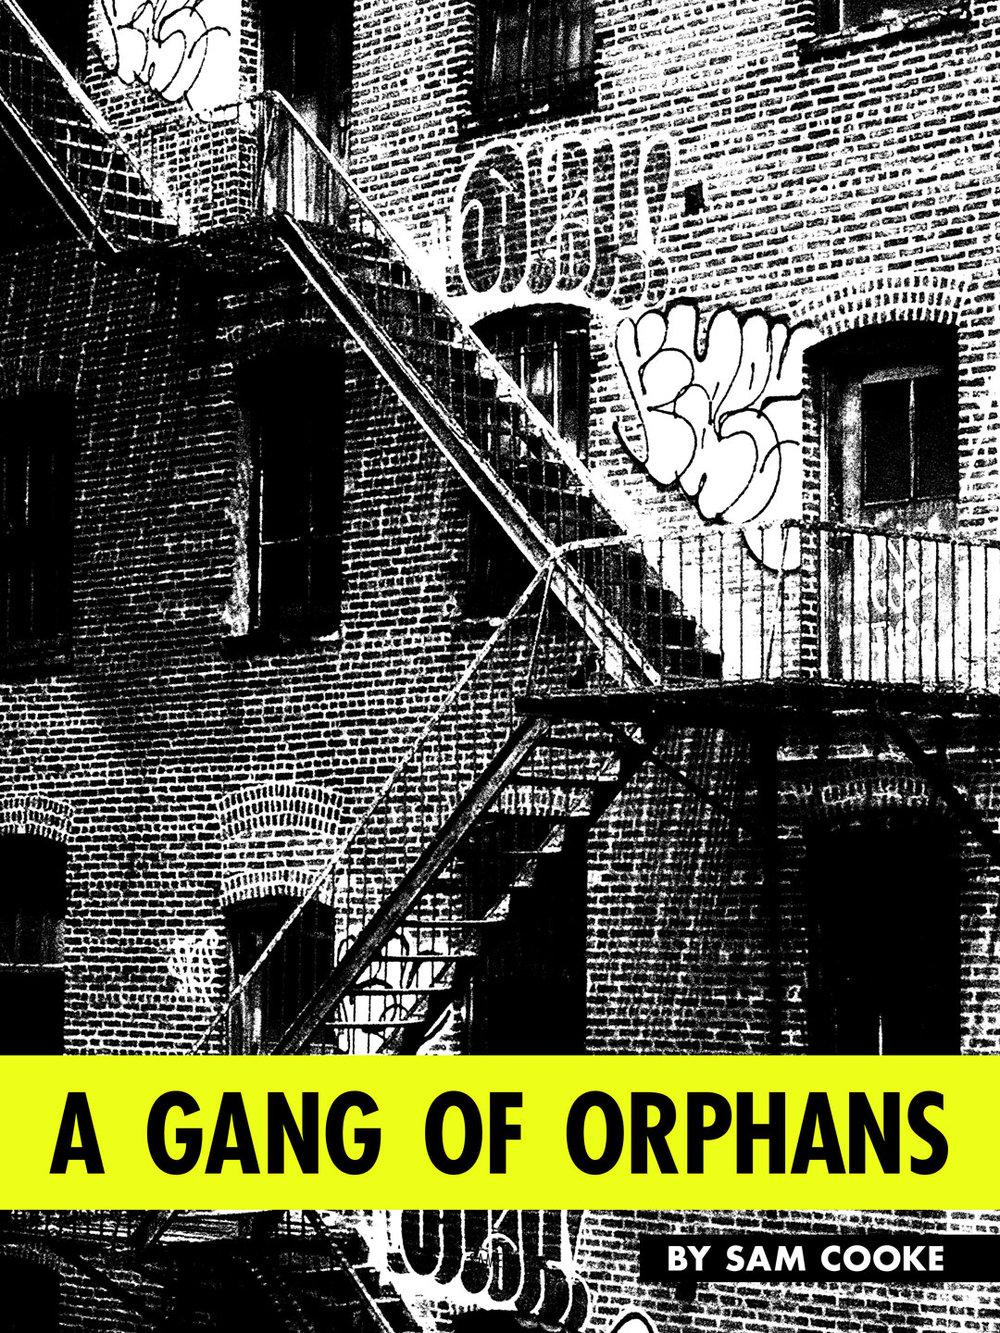 GangofOrphans_Poster_Spec.jpg